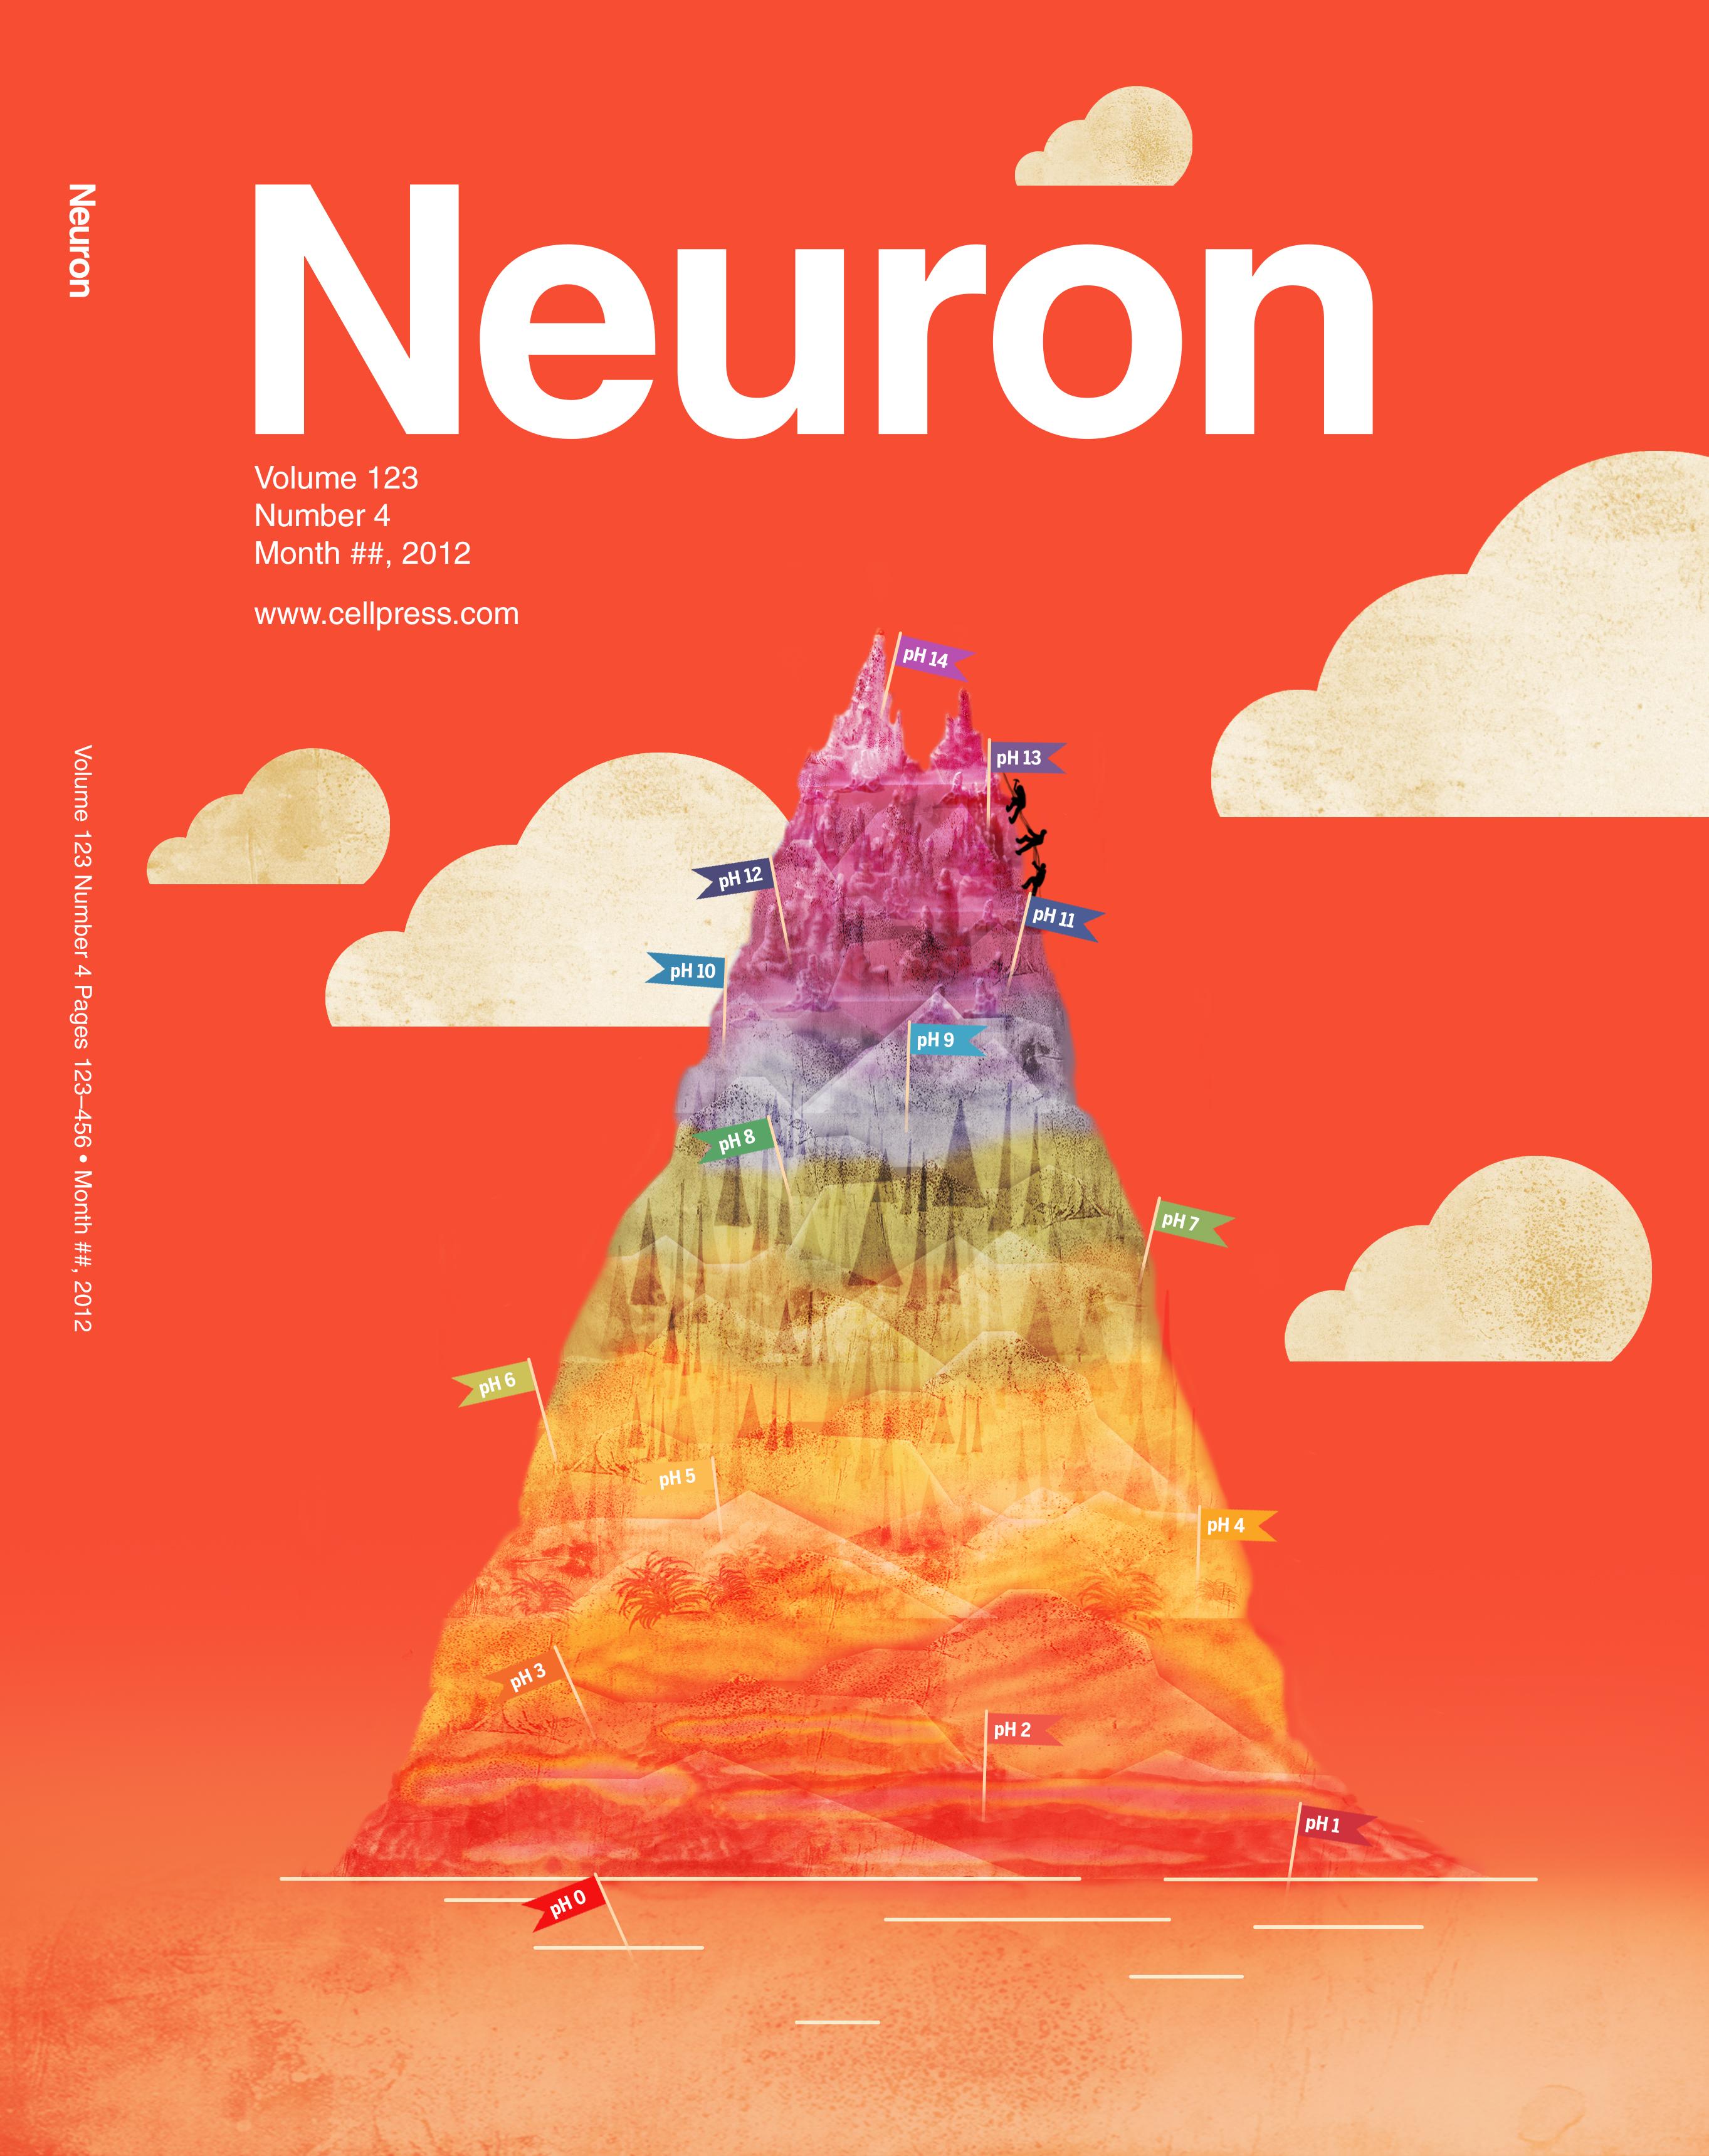 Neuron cover example